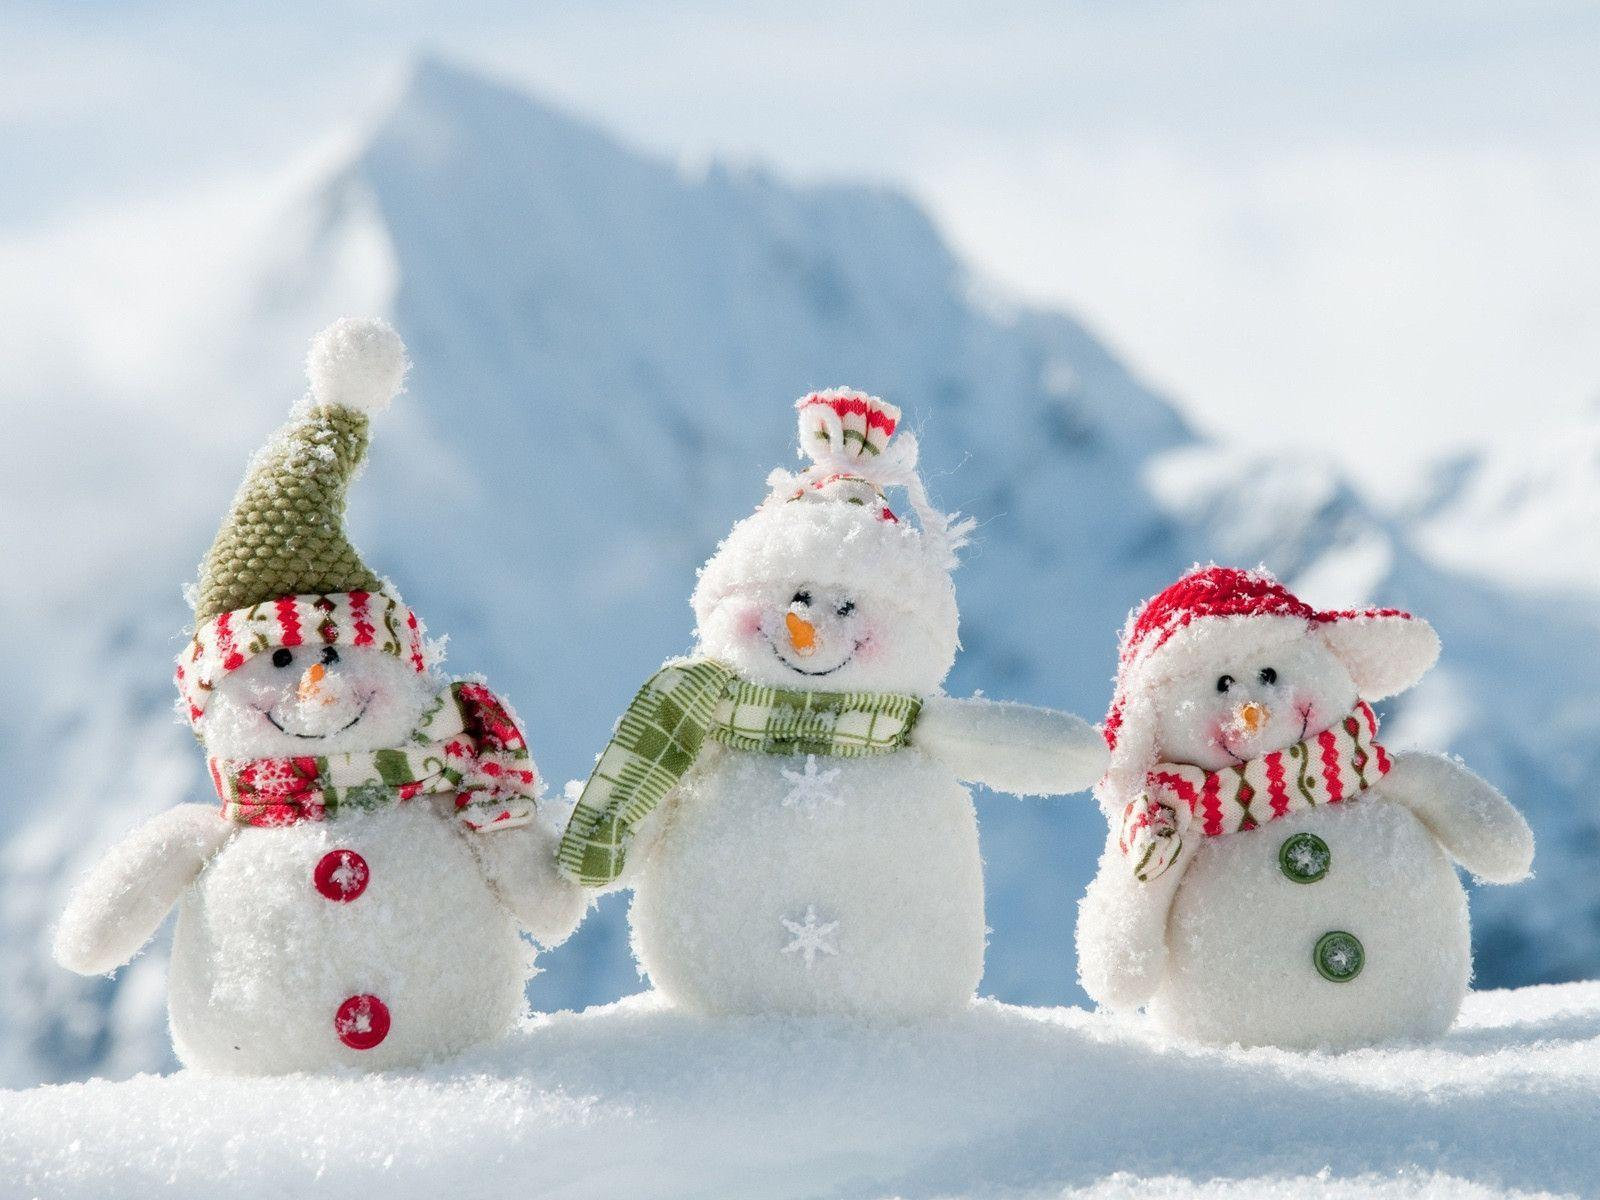 Cute Winter Picture design ideas